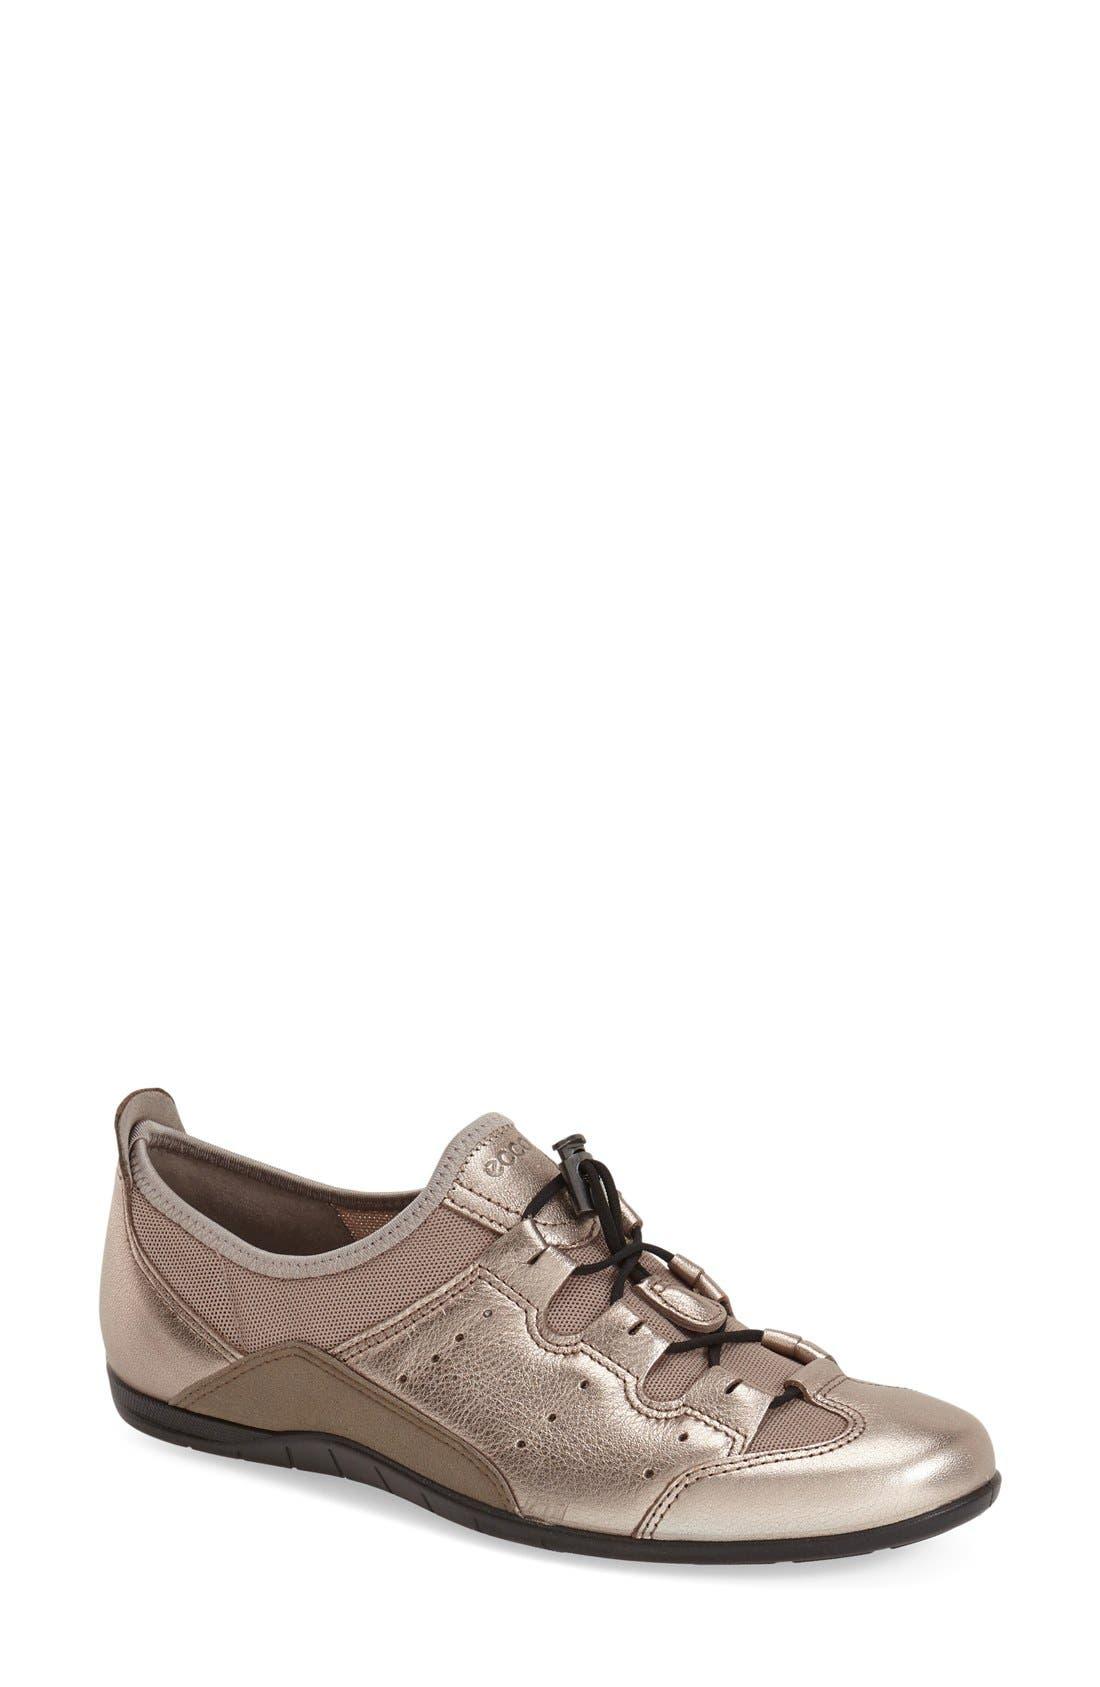 'Bluma' Sneaker,                         Main,                         color, Grey Leather Fabric